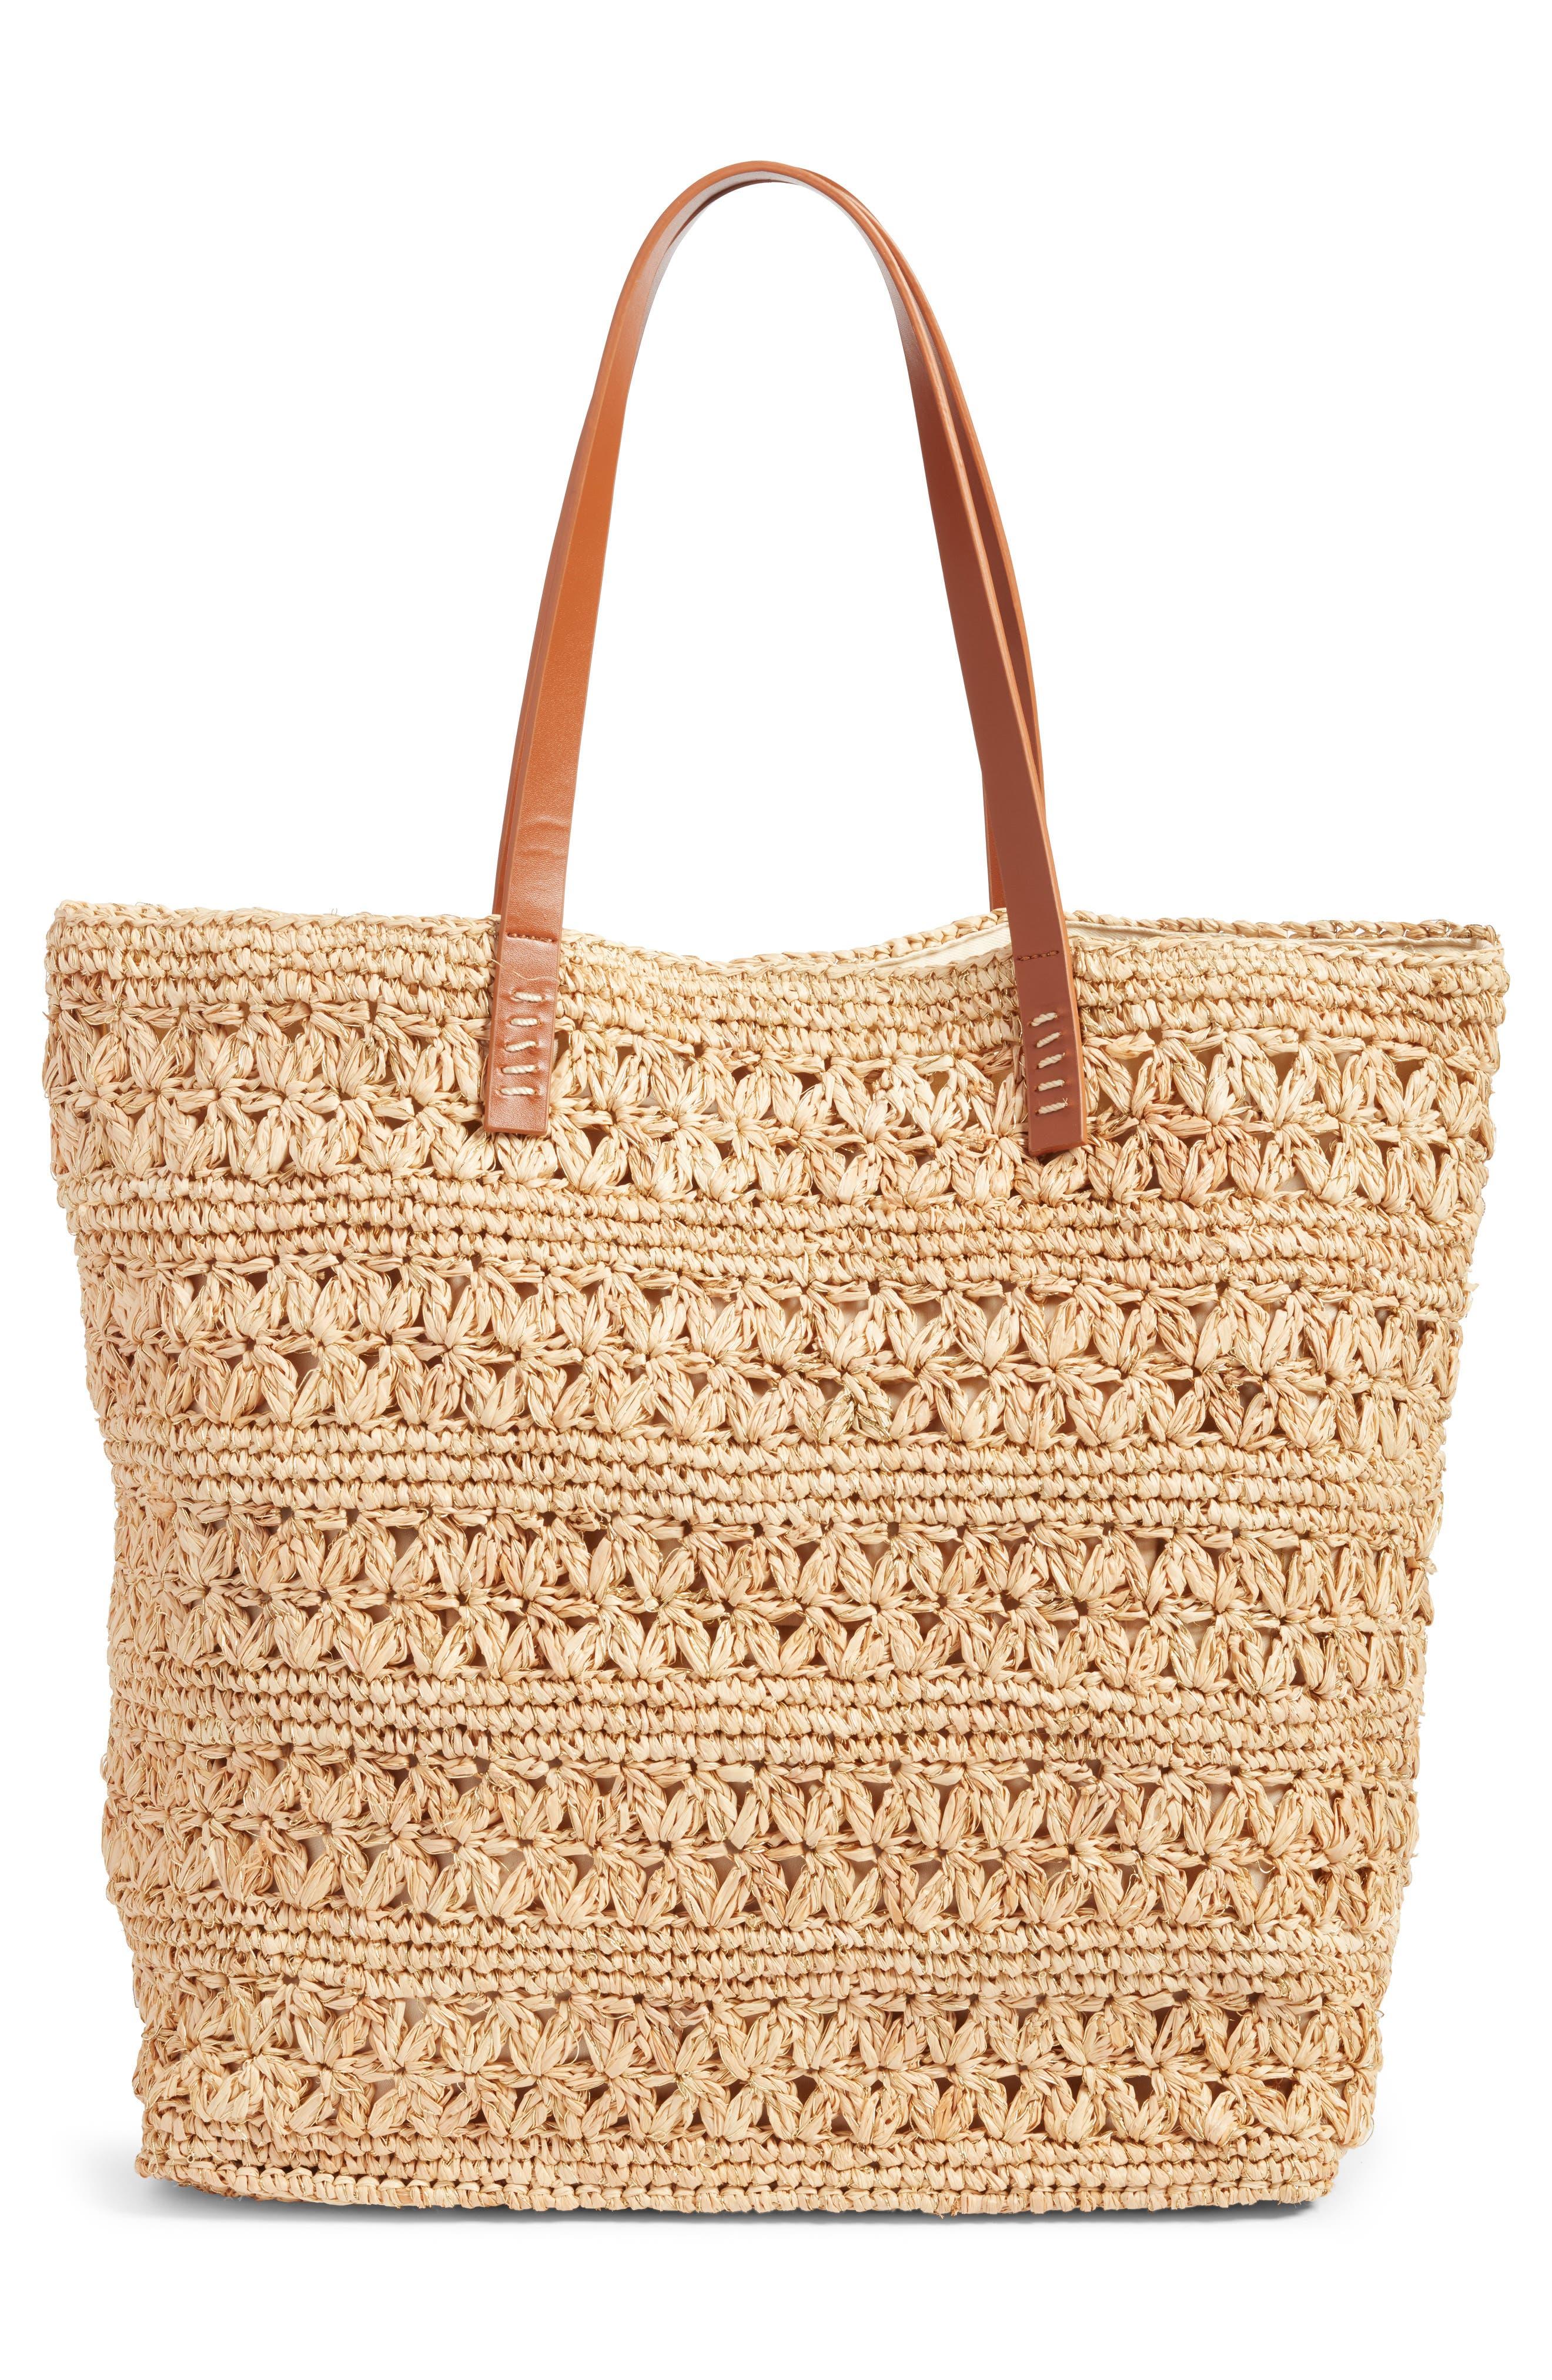 Packable Raffia Crochet Tote,                             Alternate thumbnail 3, color,                             Natural/ Gold